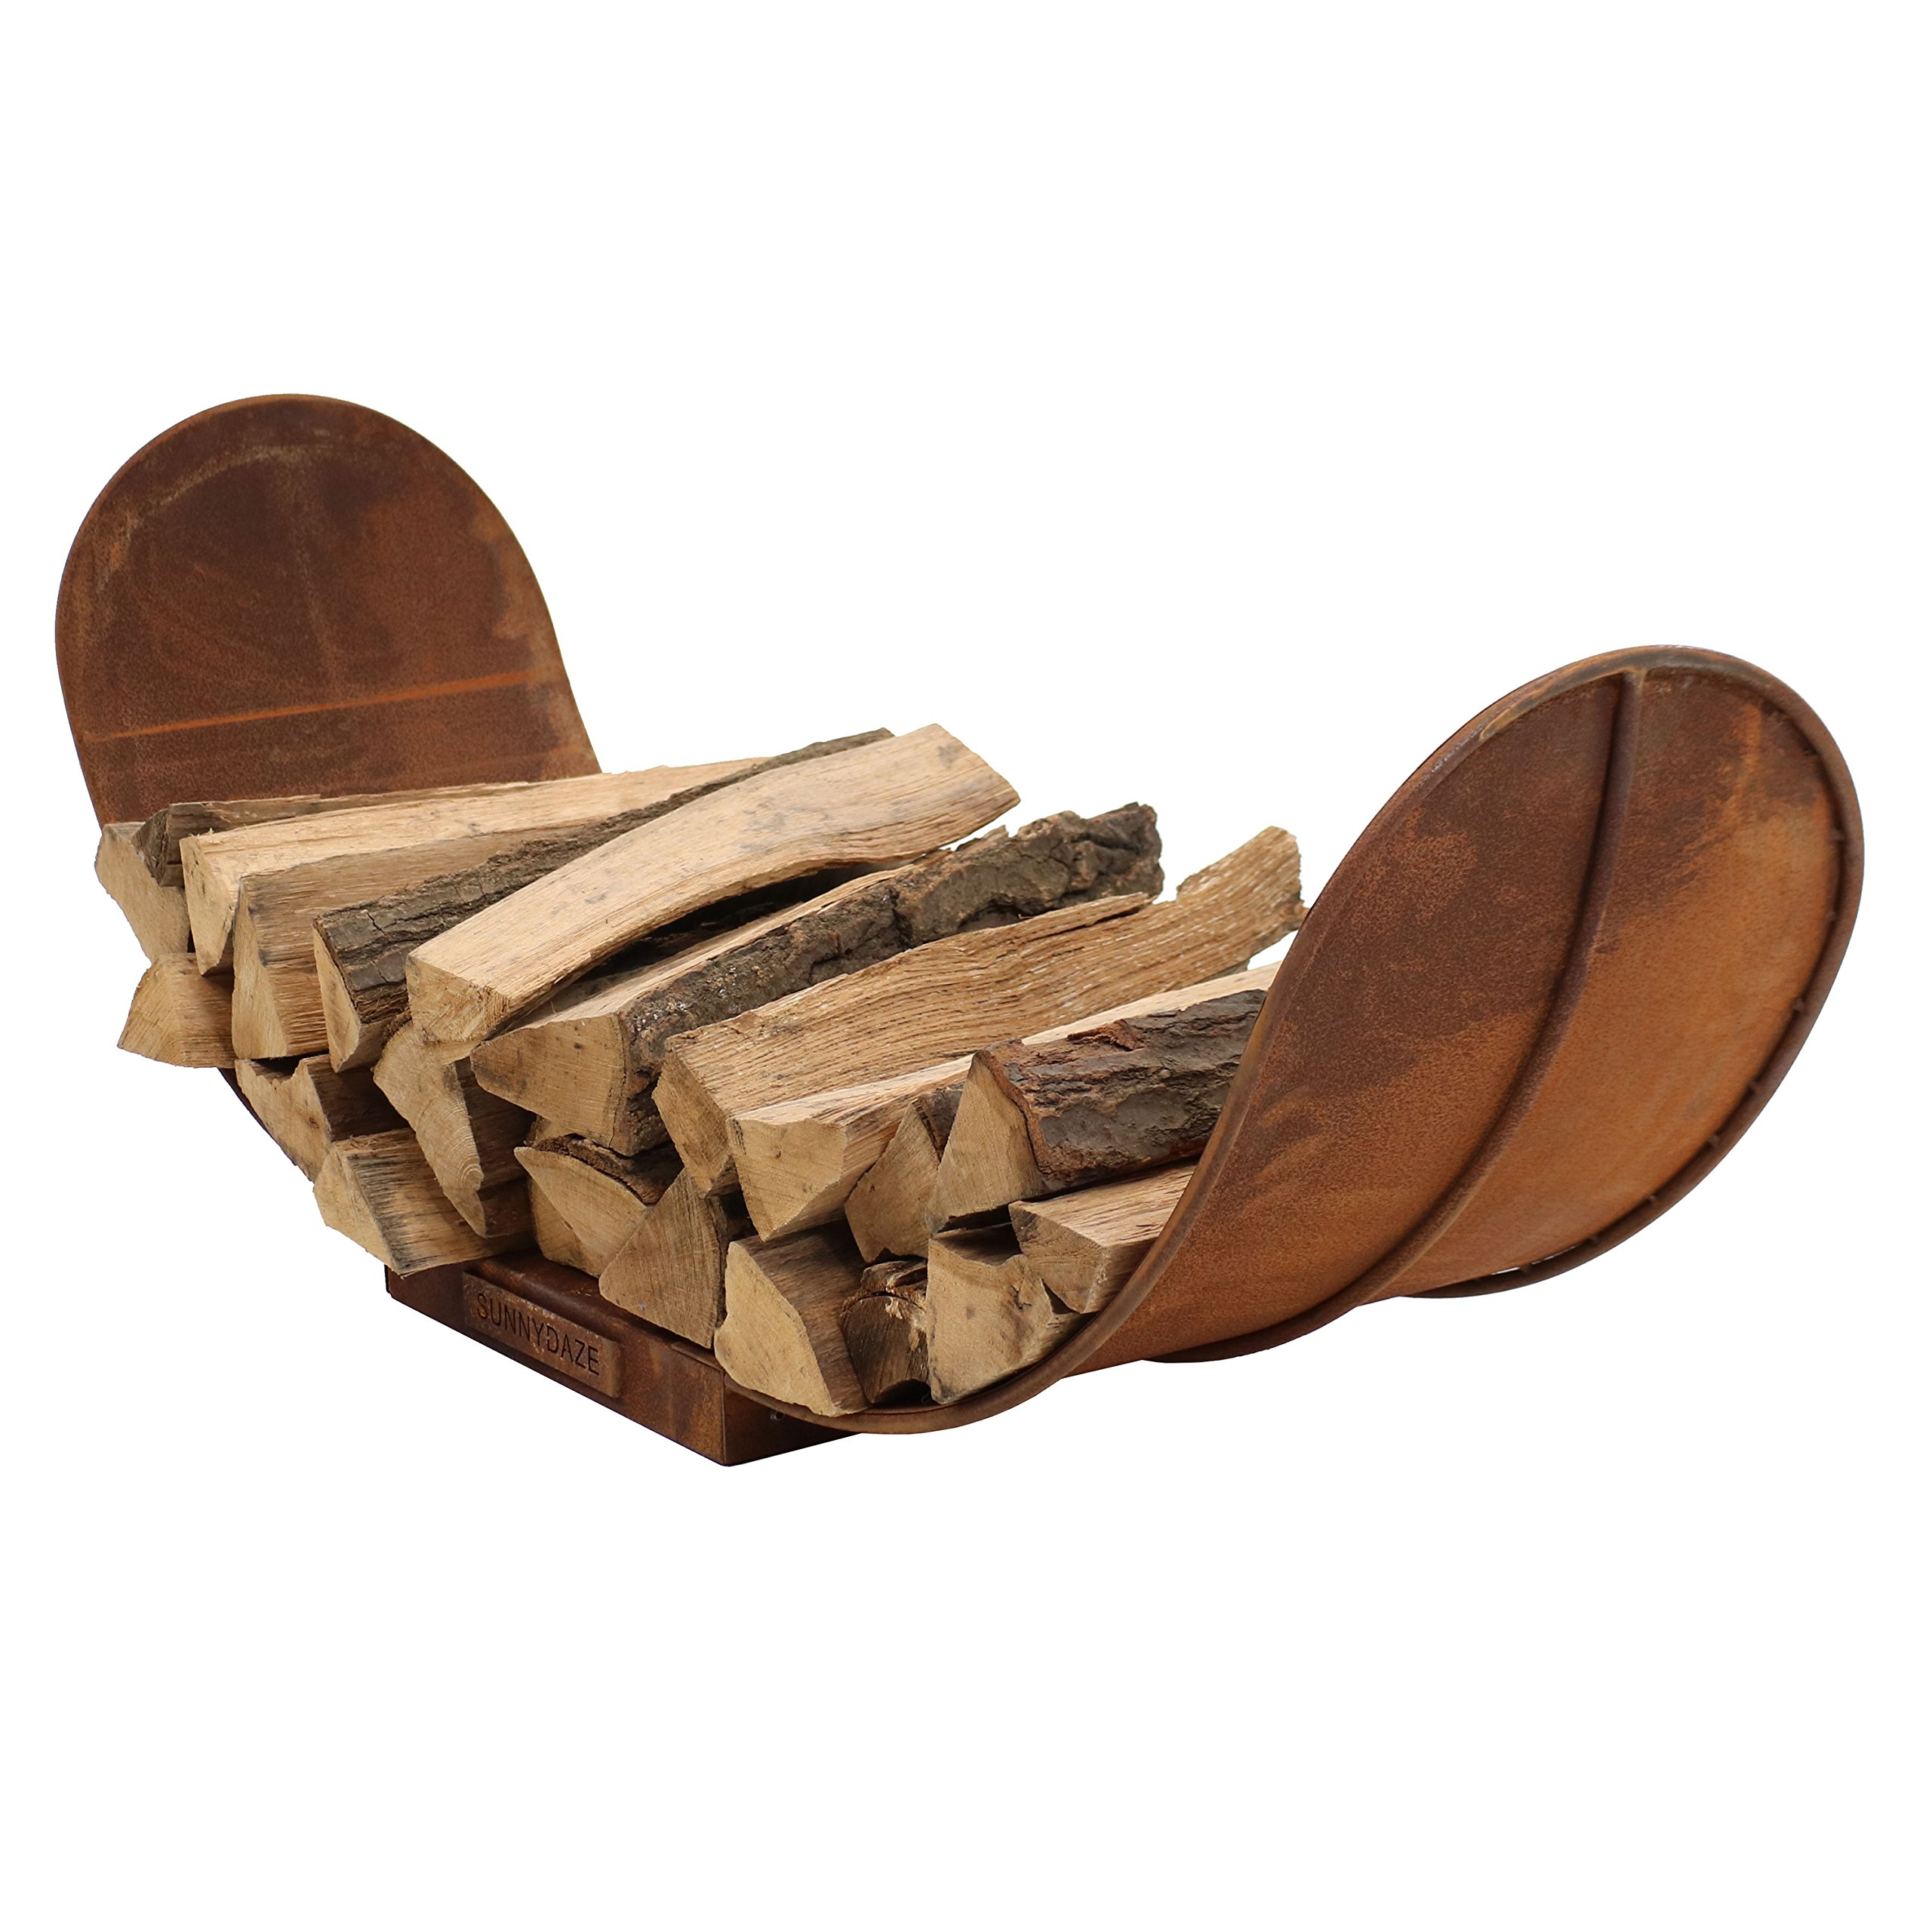 Sunnydaze 4-Foot Firewood Log Rack, Outdoor Fireplace Wood Storage Holder, Rustic by Sunnydaze Decor